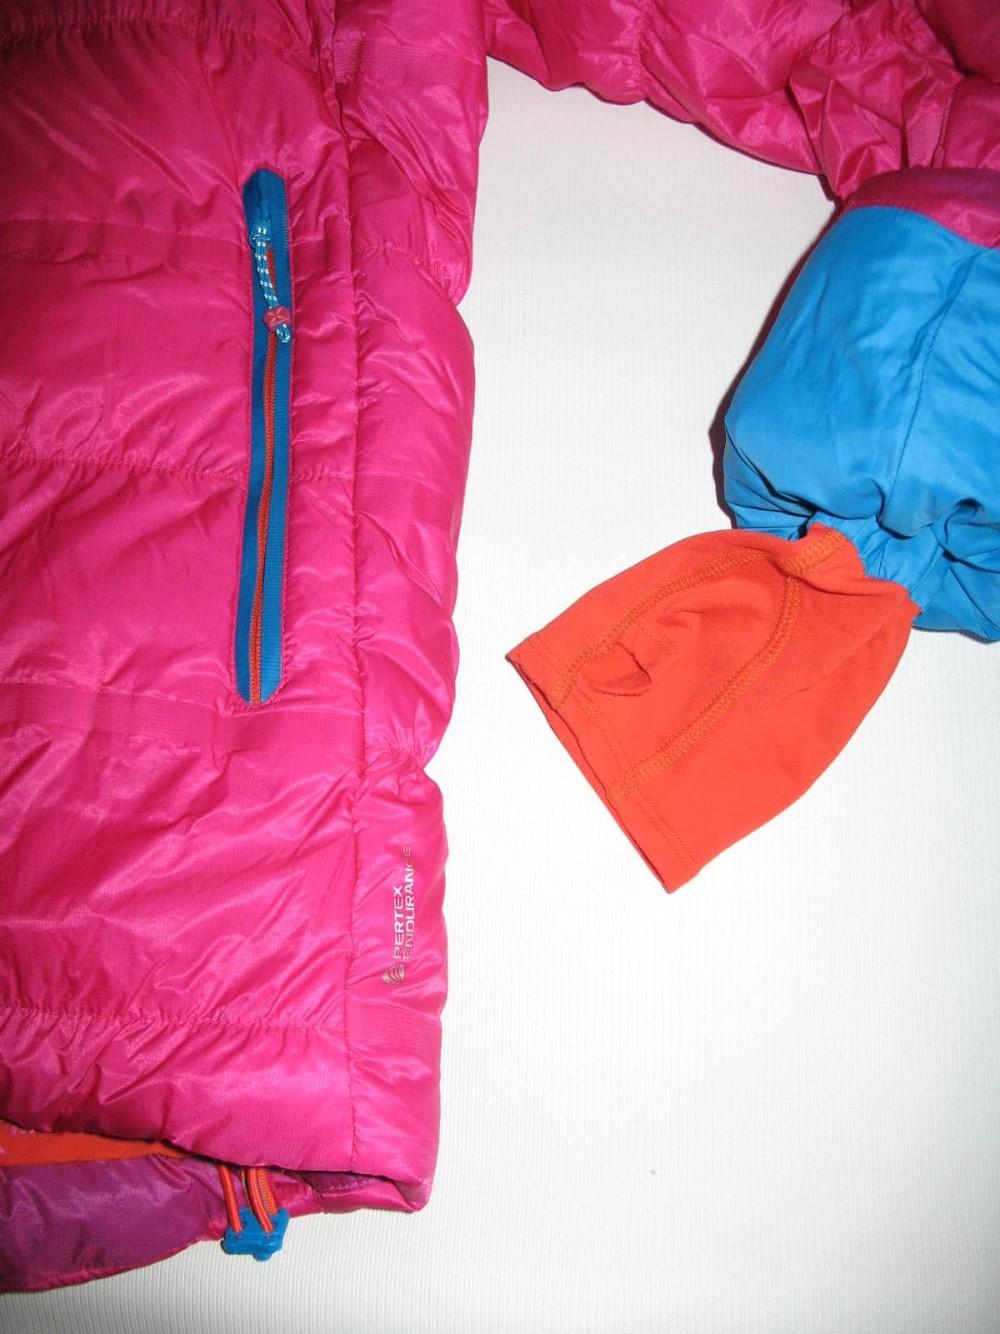 Куртка MAMMUT biwak eiger extreme jacket lady (размер S/M) - 8